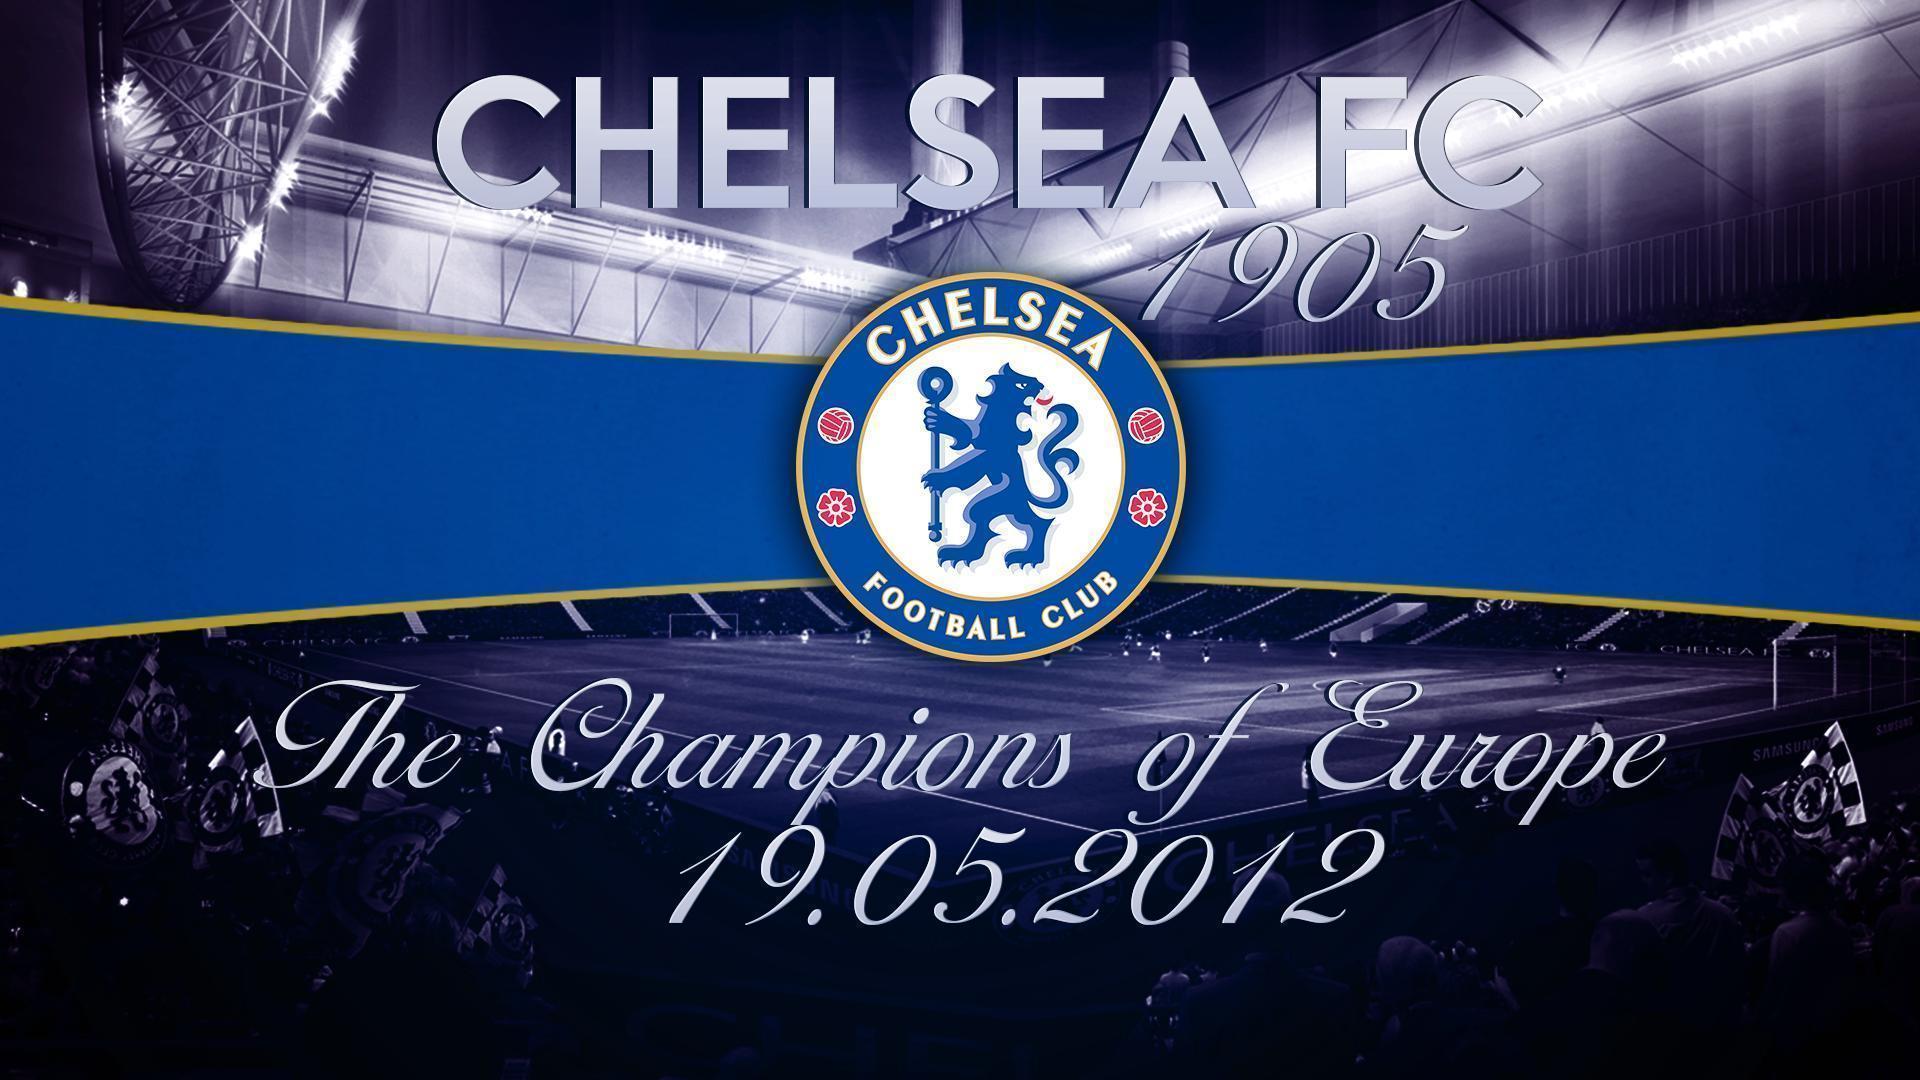 Chelsea Fc Desktop Wallpaper: Football Wallpapers Chelsea FC